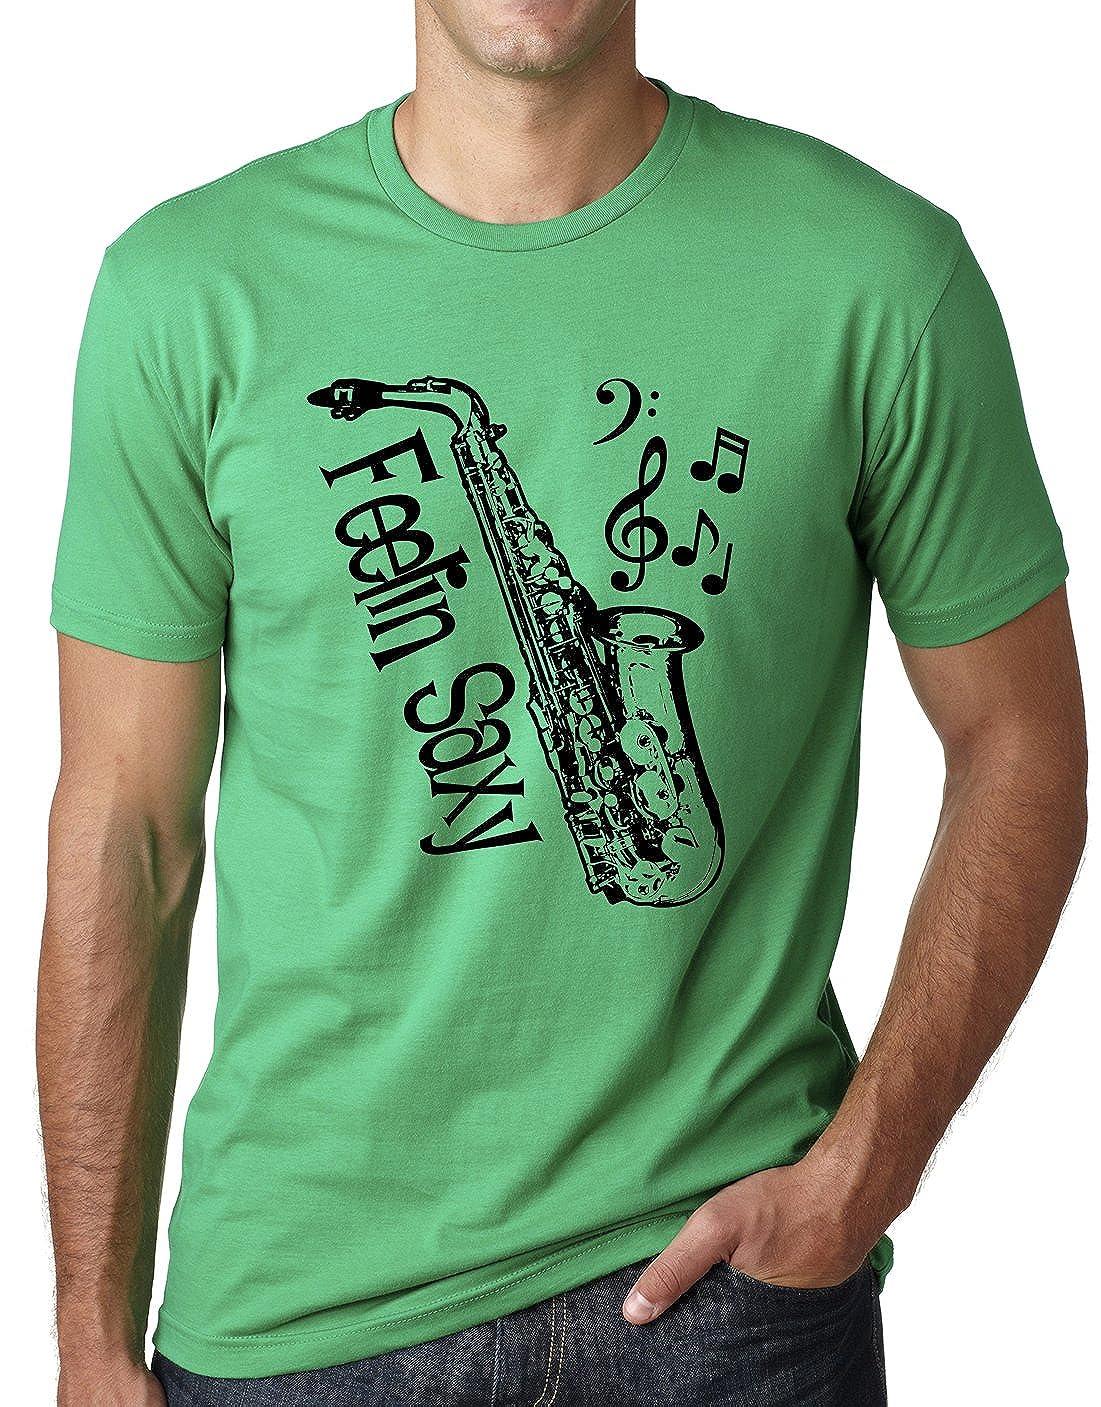 397bac9e Think Out Loud Apparel Feelin Saxy Funny Saxophone T-Shirt Sax Humor Tee    Amazon.com